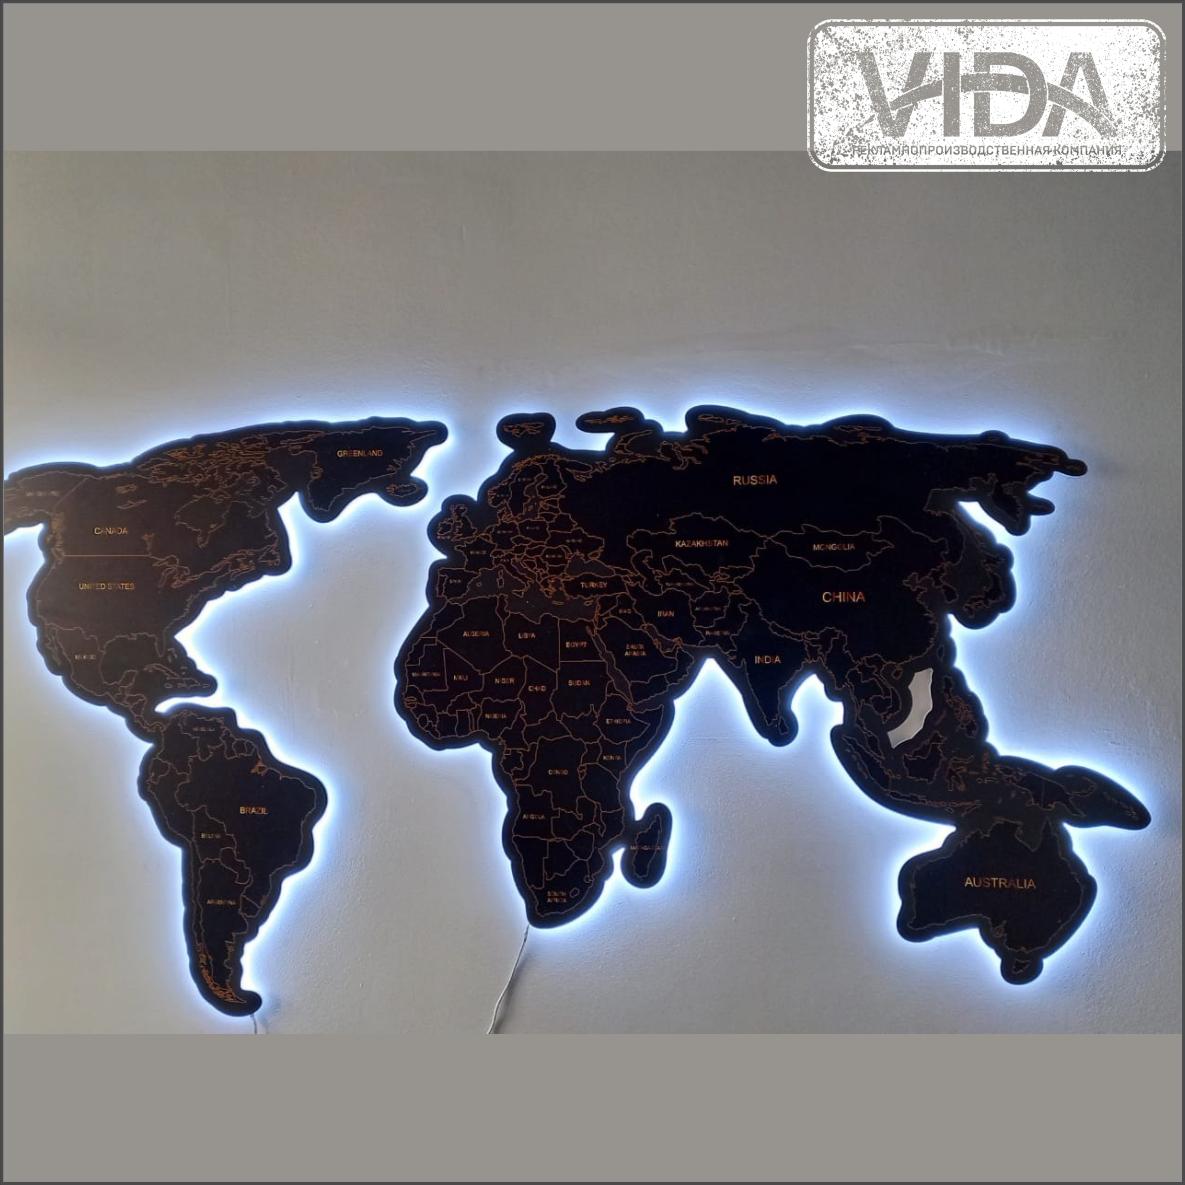 Карта мира из ПВХ с подсветкой